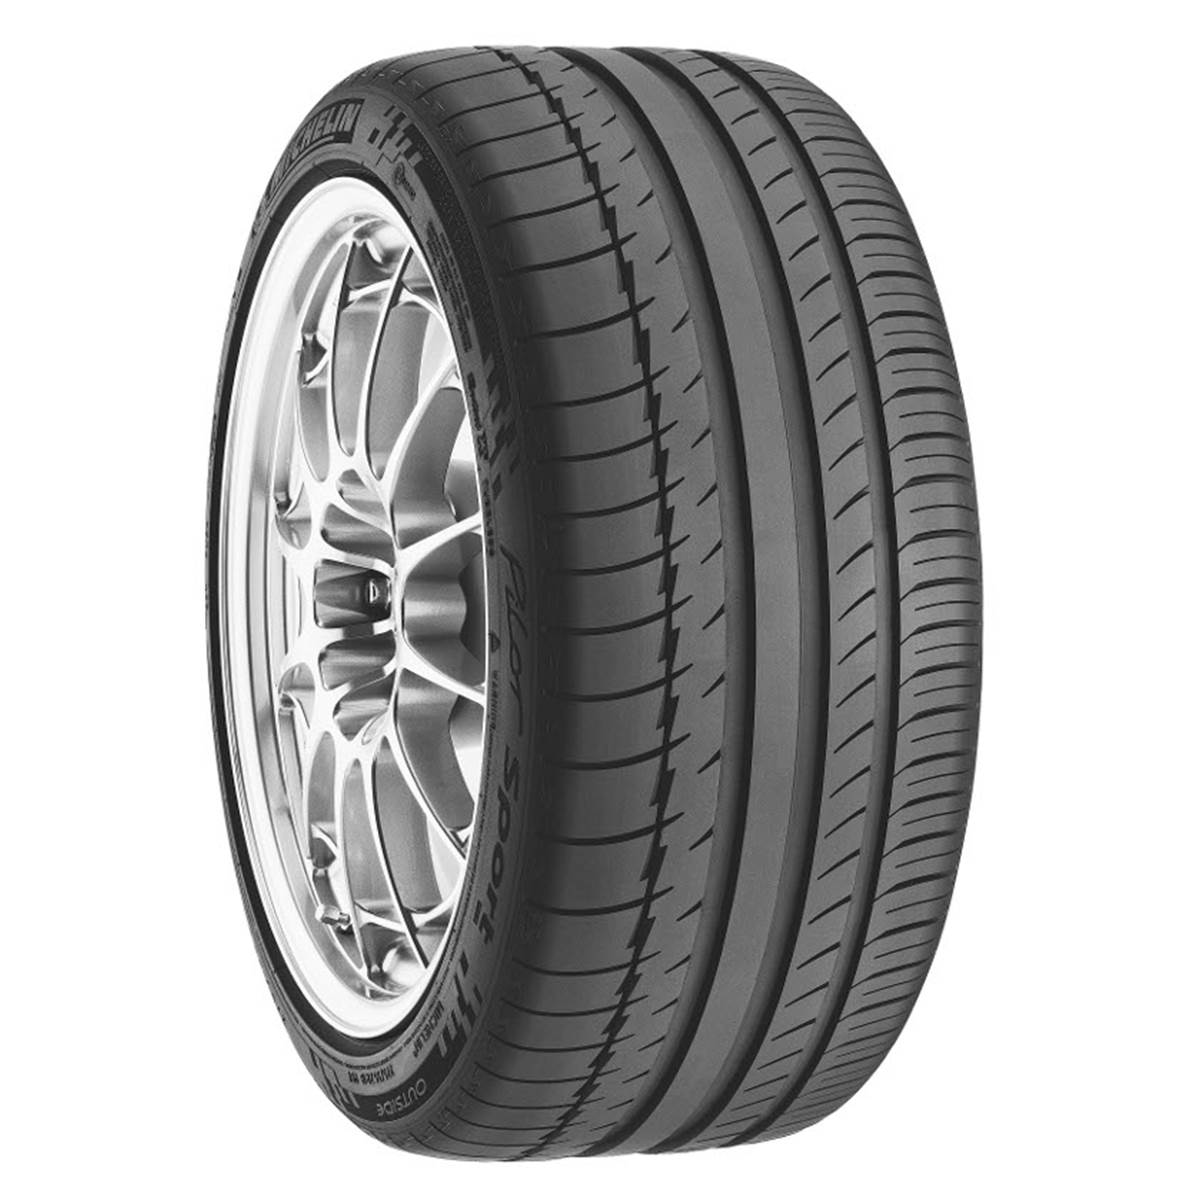 Pneu Michelin 255/30R22 95Y Pilot Sport Ps2 XL